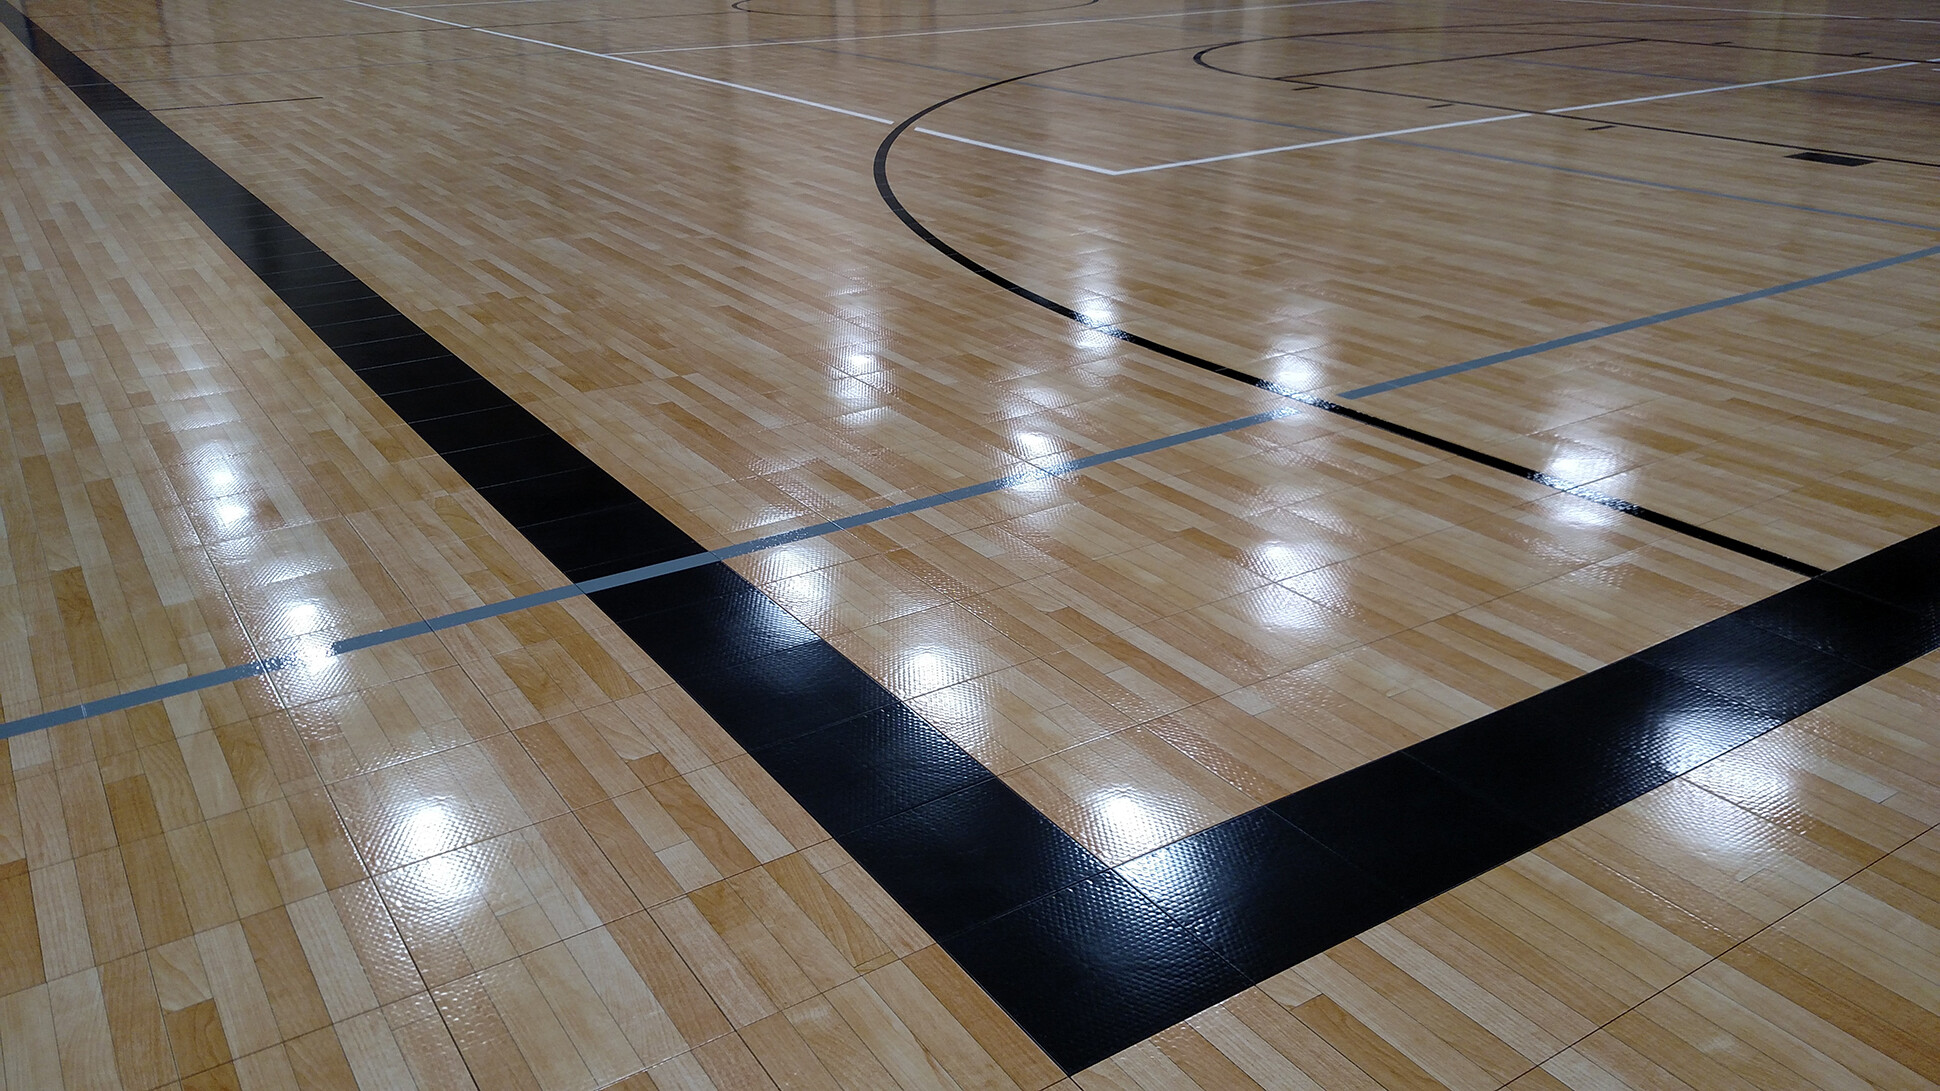 Tournament Gym Navarro ISD Sport Court